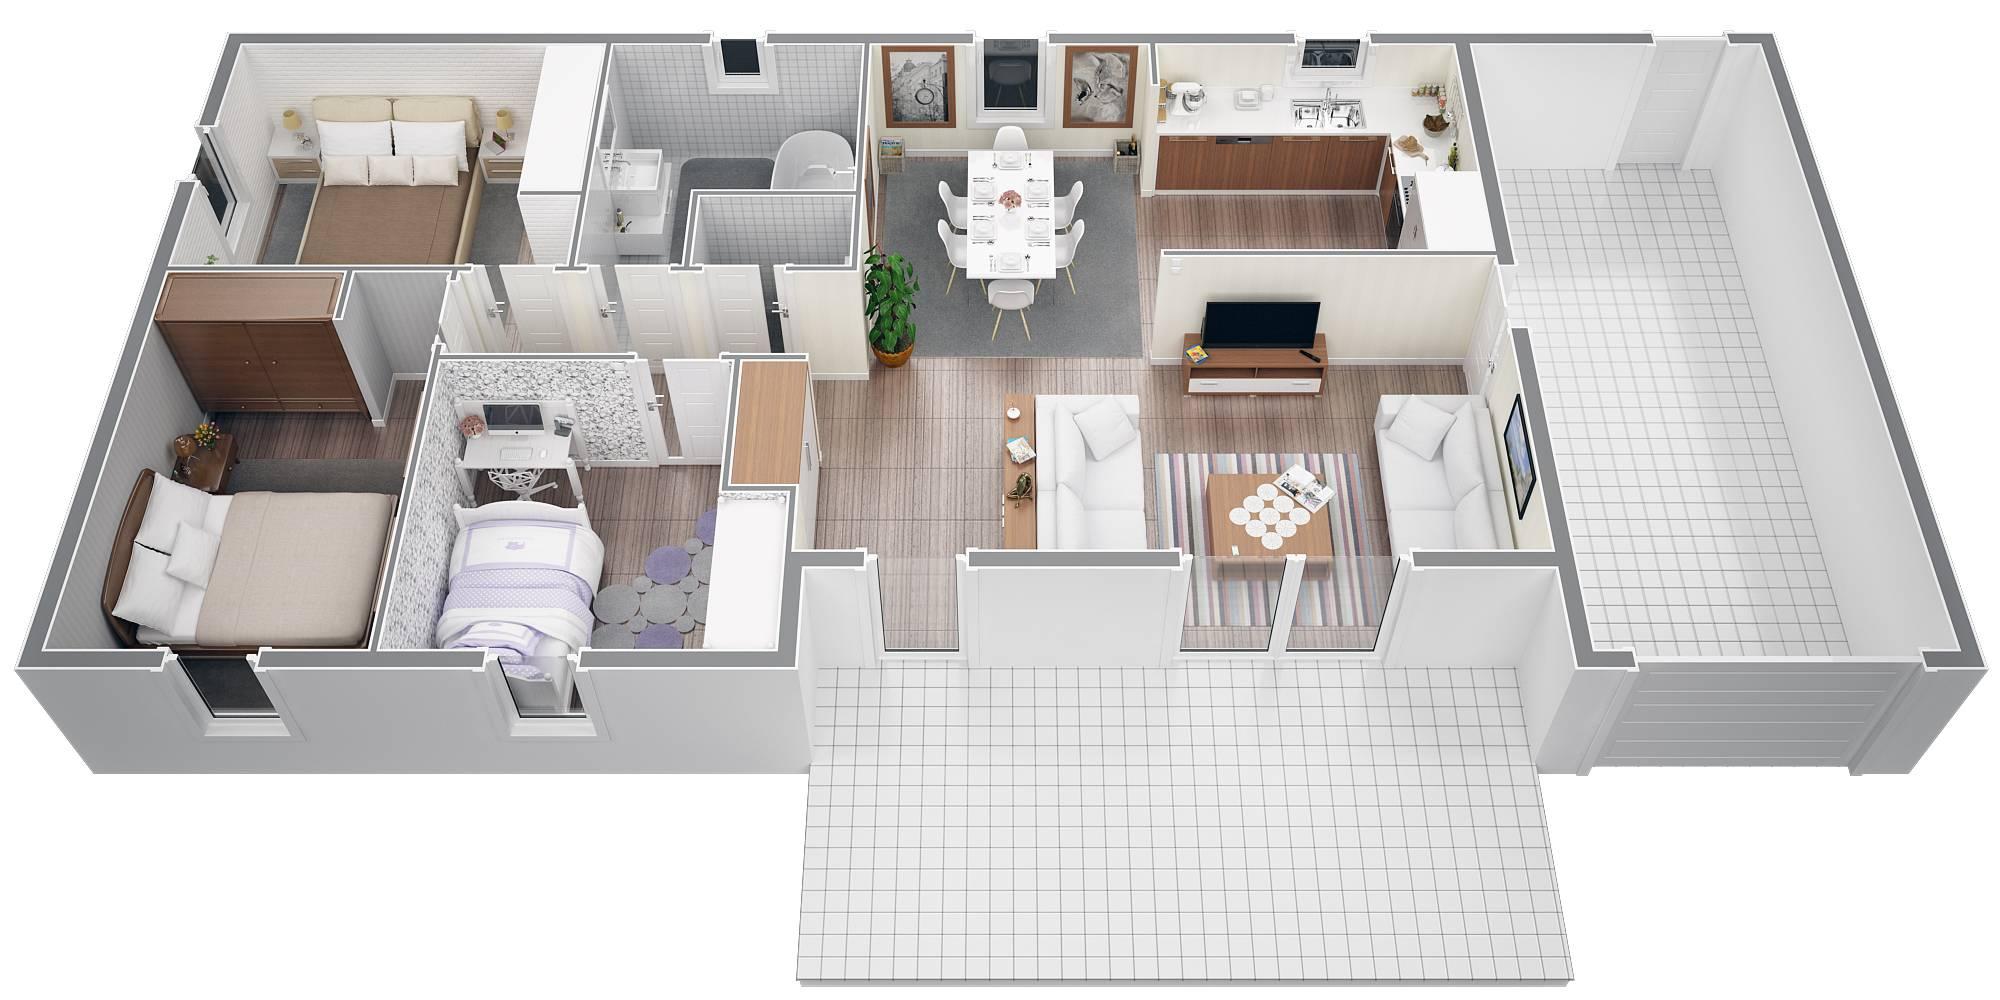 maison moderne 3 chambres